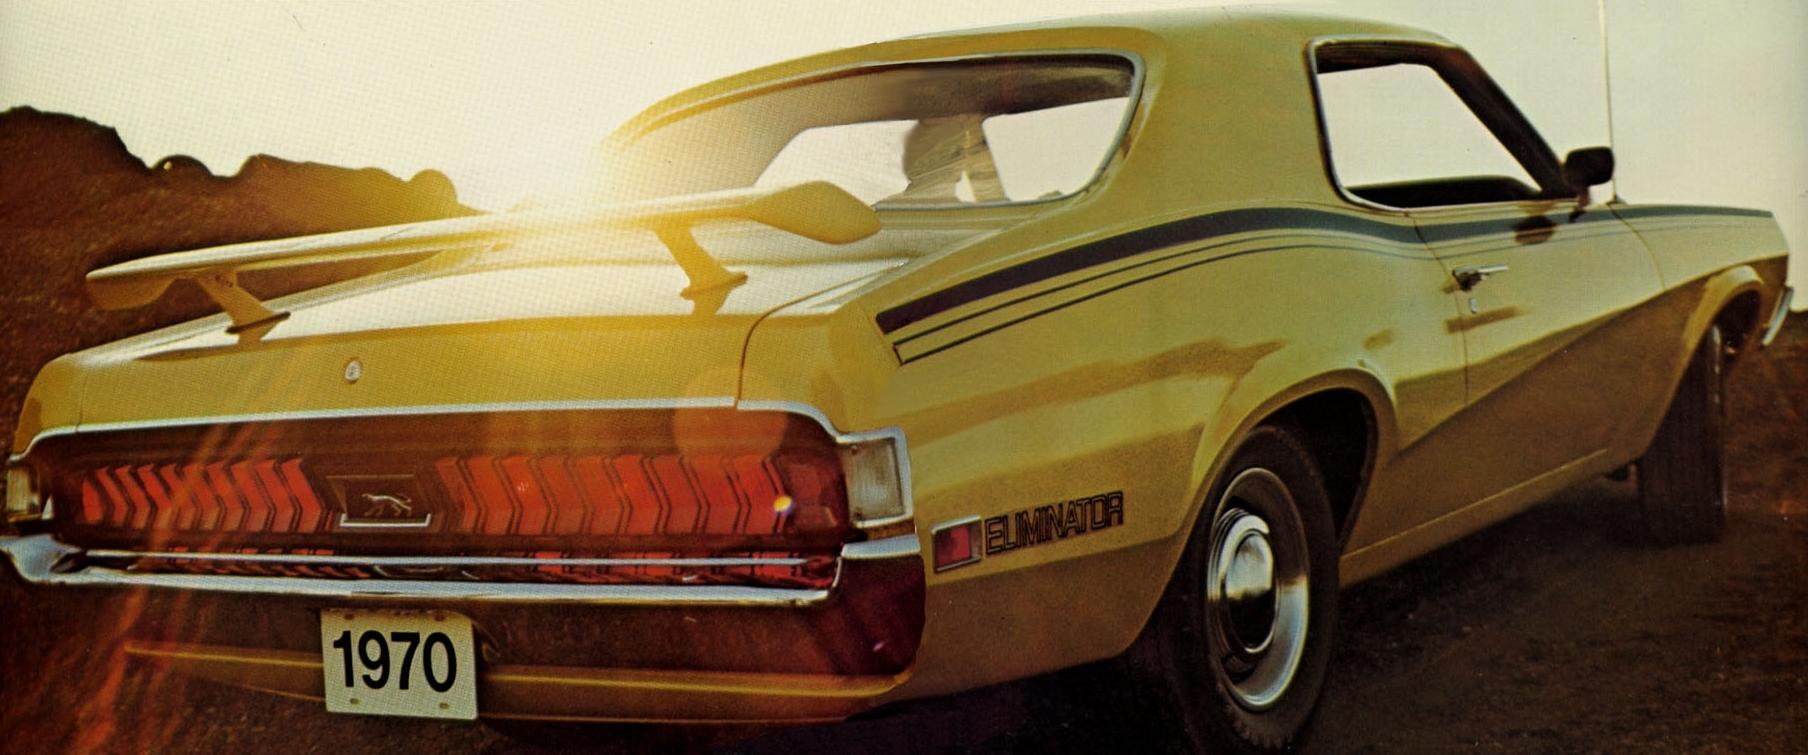 Mercury Cougar Eliminator Rear